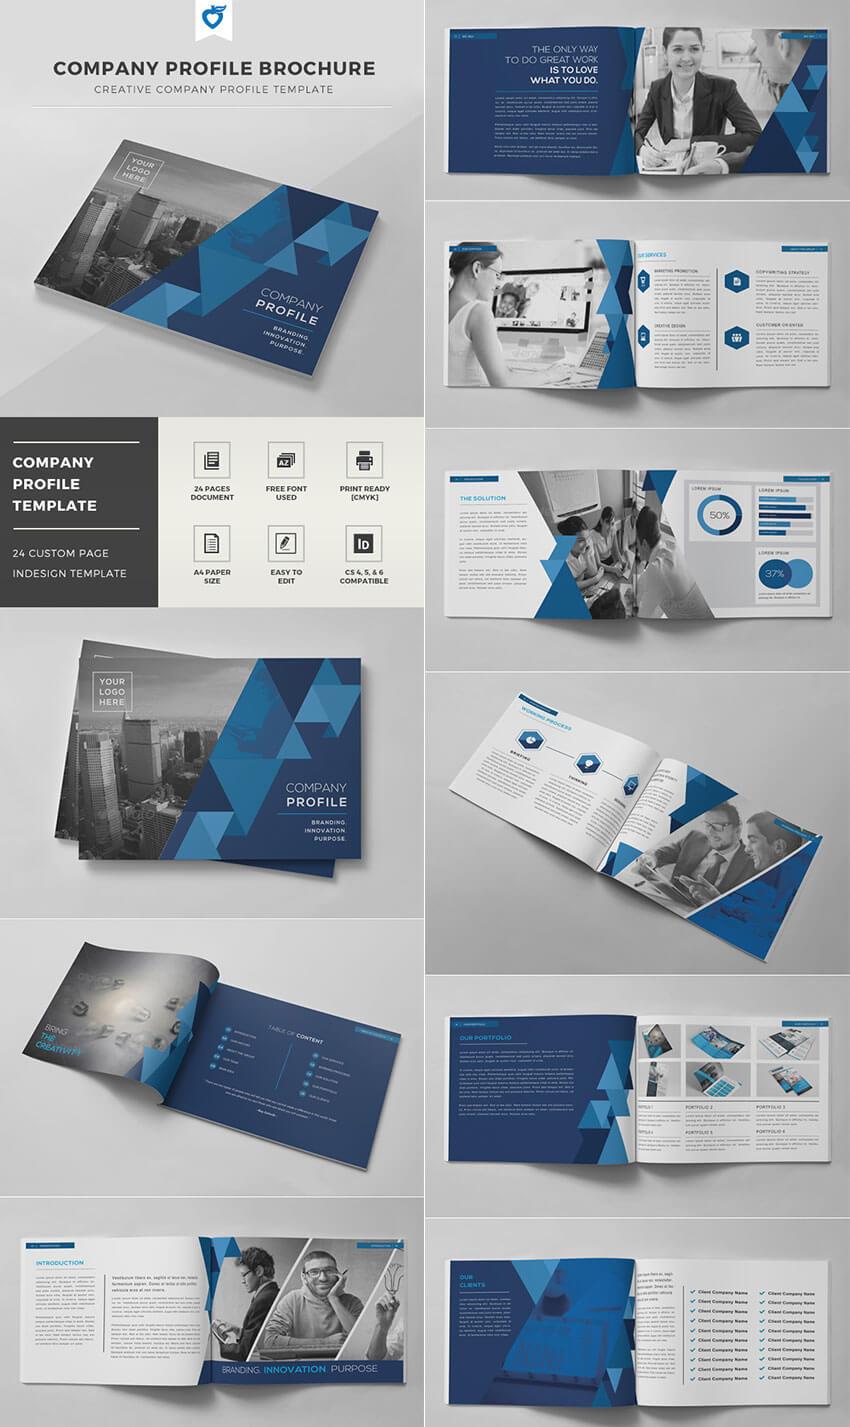 30 Best Indesign Brochure Templates - Creative Business Inside Brochure Template Indesign Free Download